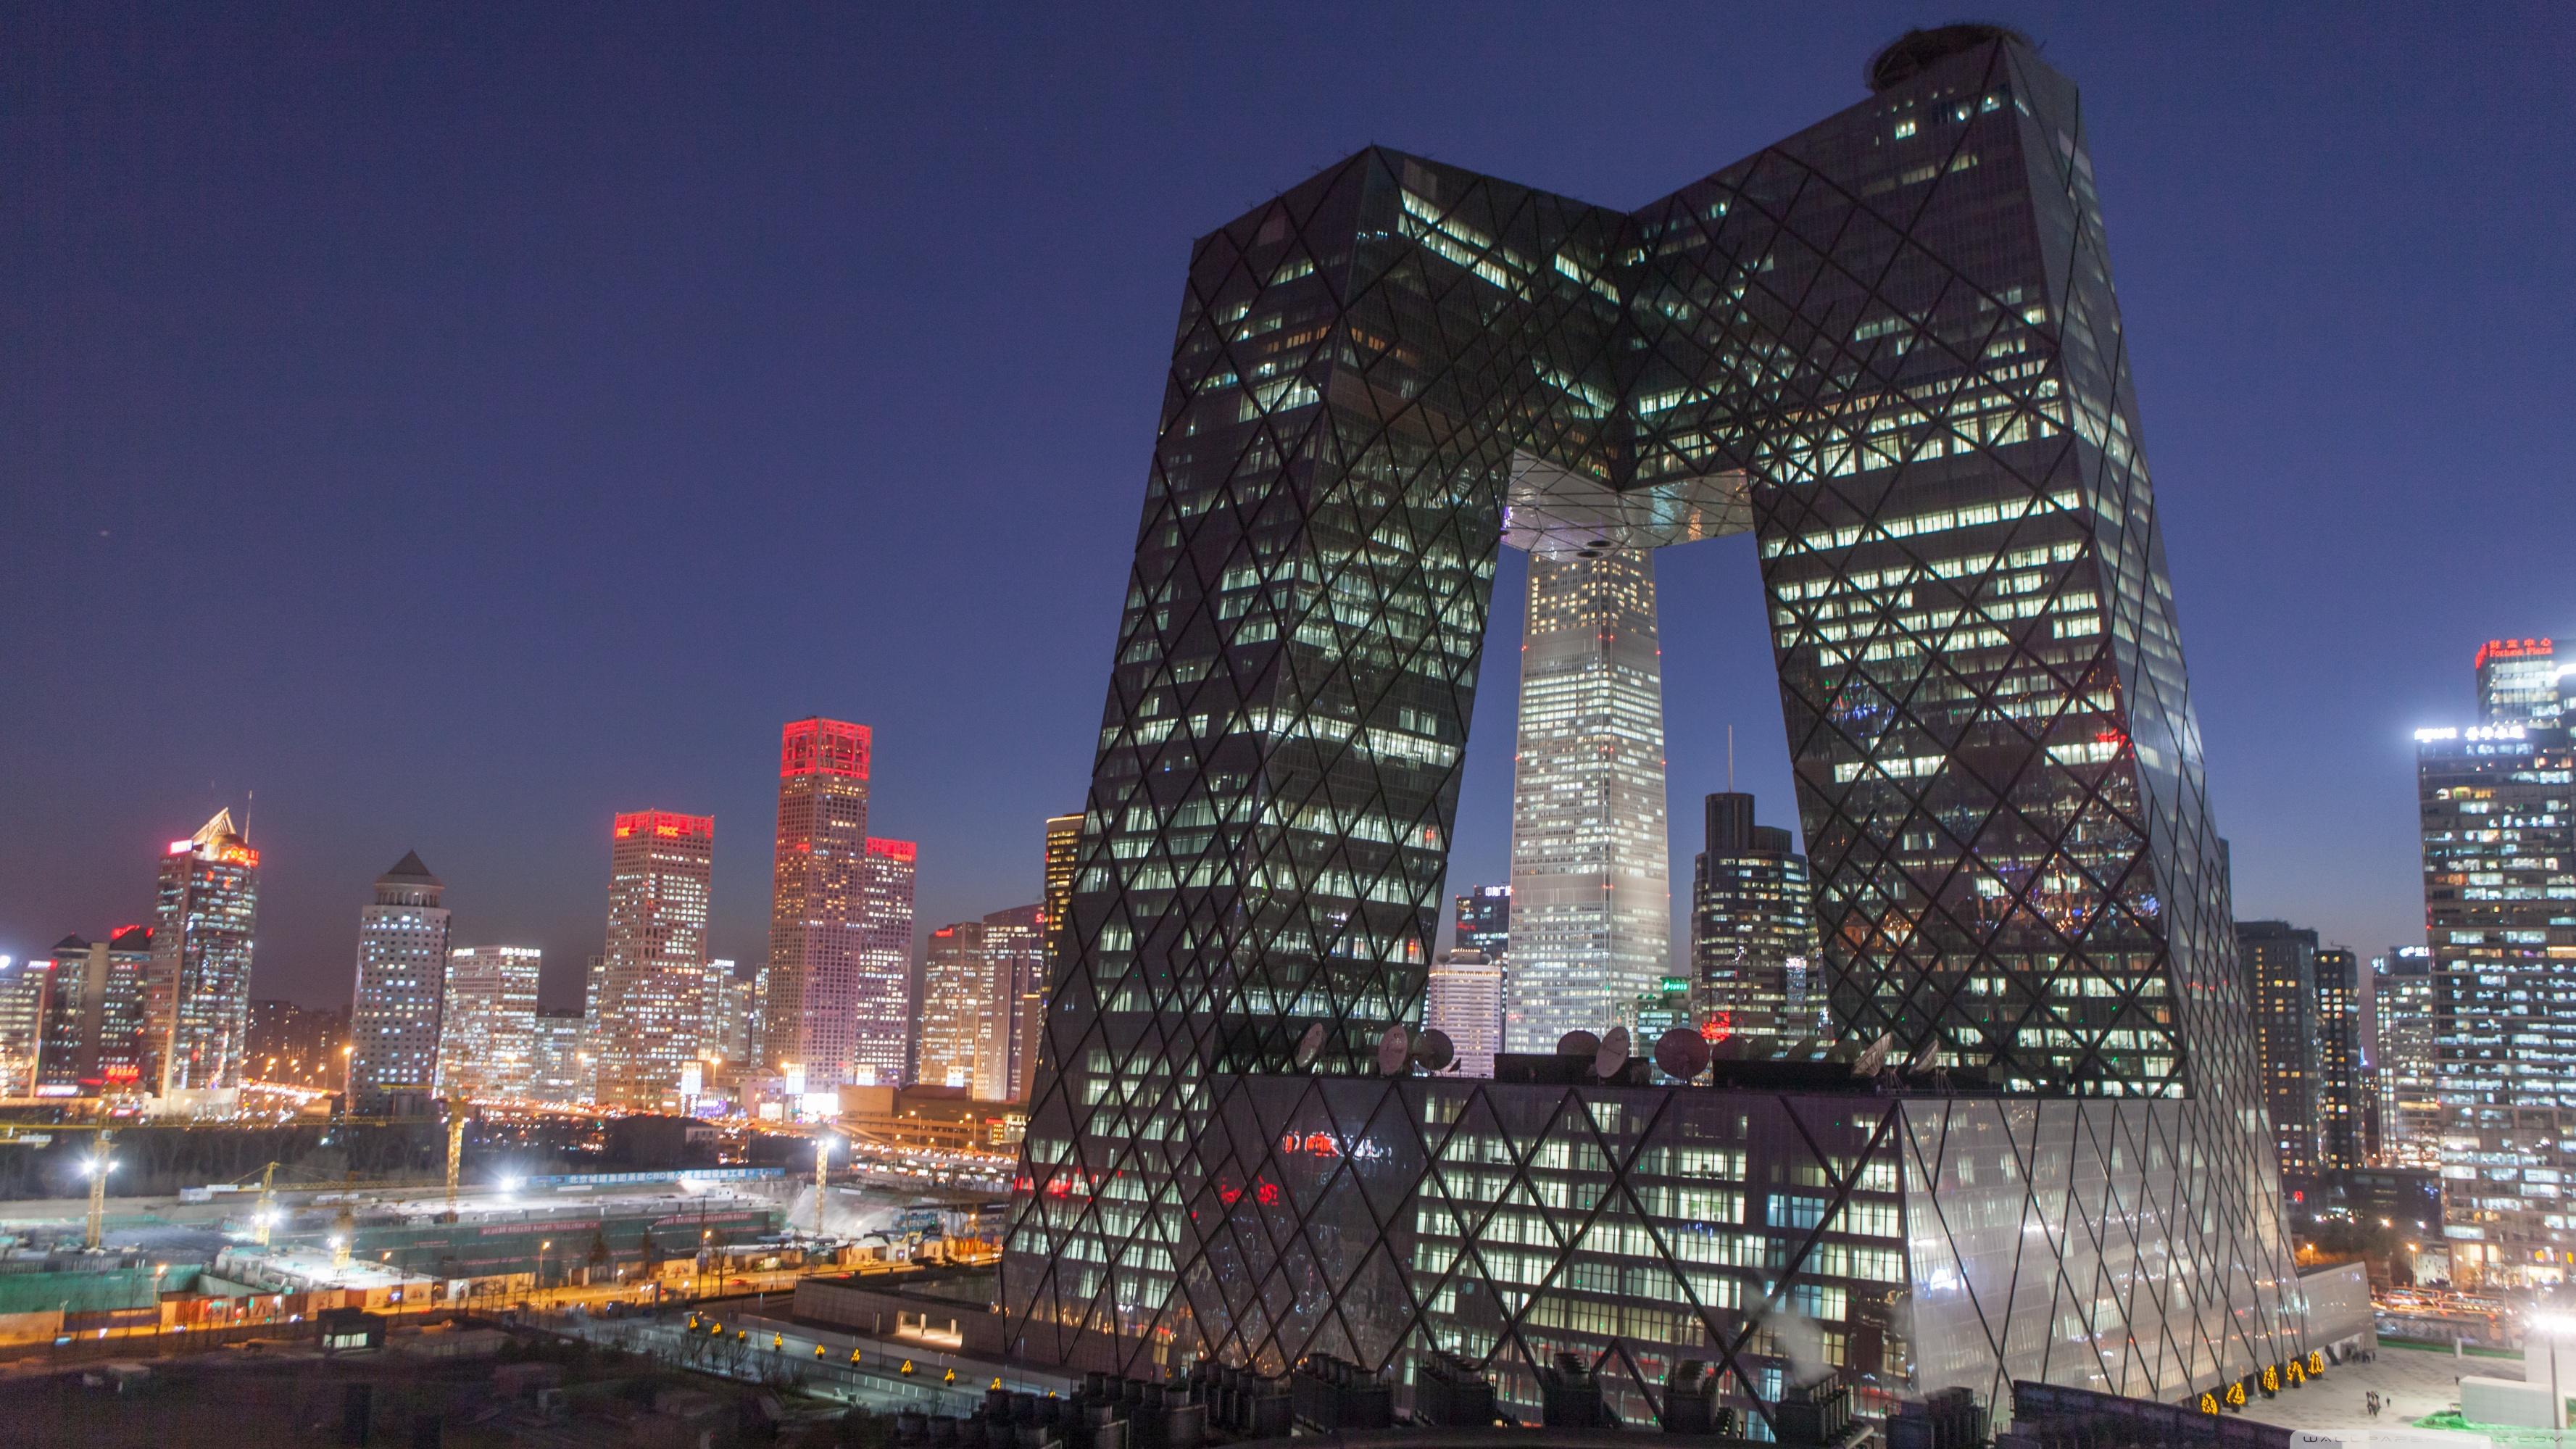 CCTV Building Beijing China 4K HD Desktop Wallpaper for 4K 3554x1999